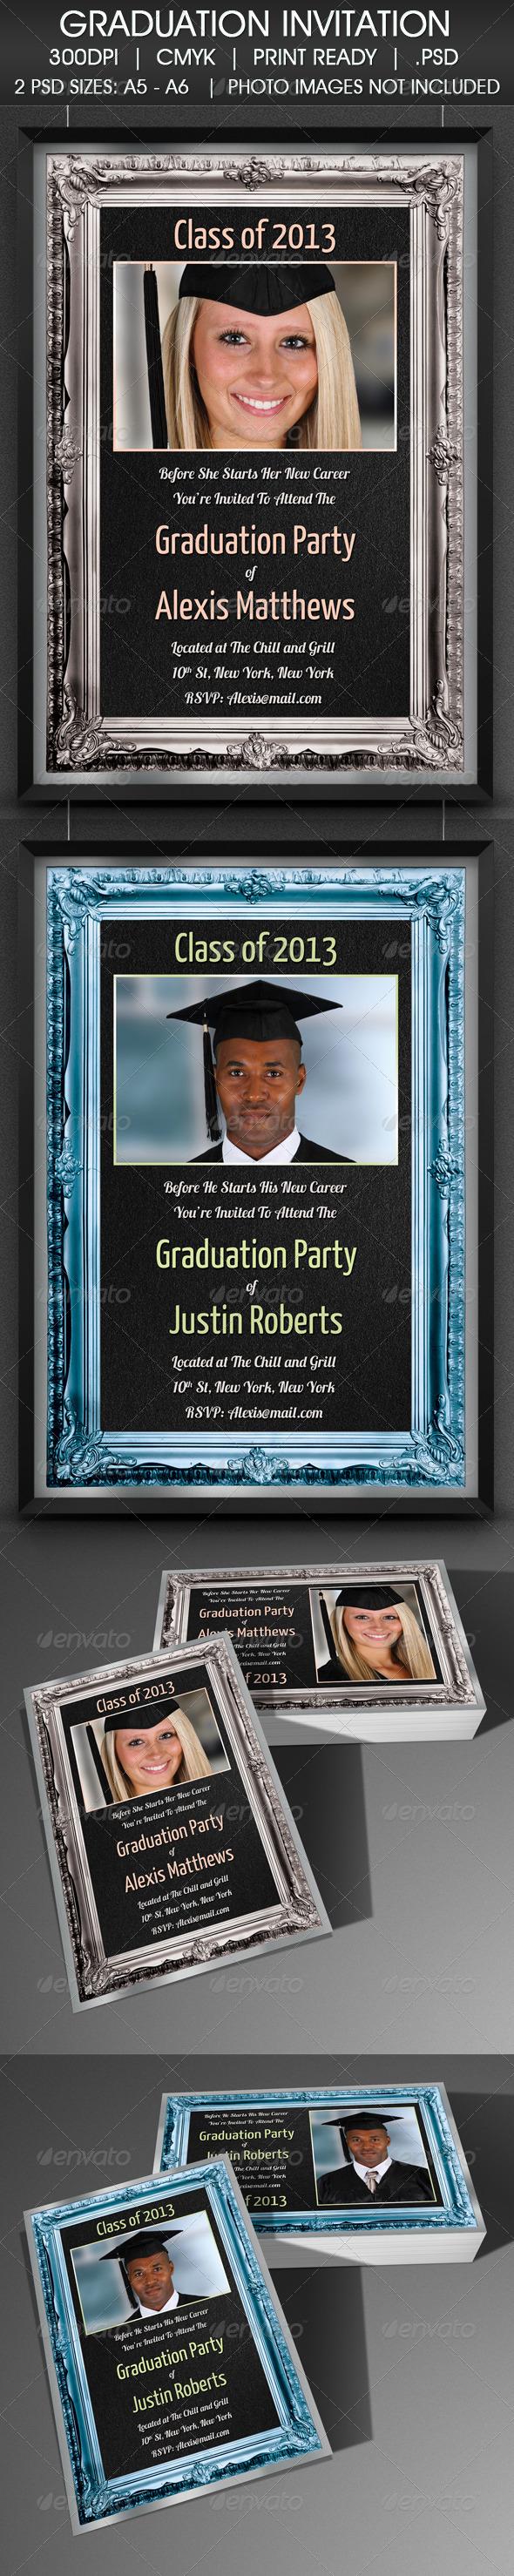 Graduation Party Degree Invitation - Invitations Cards & Invites